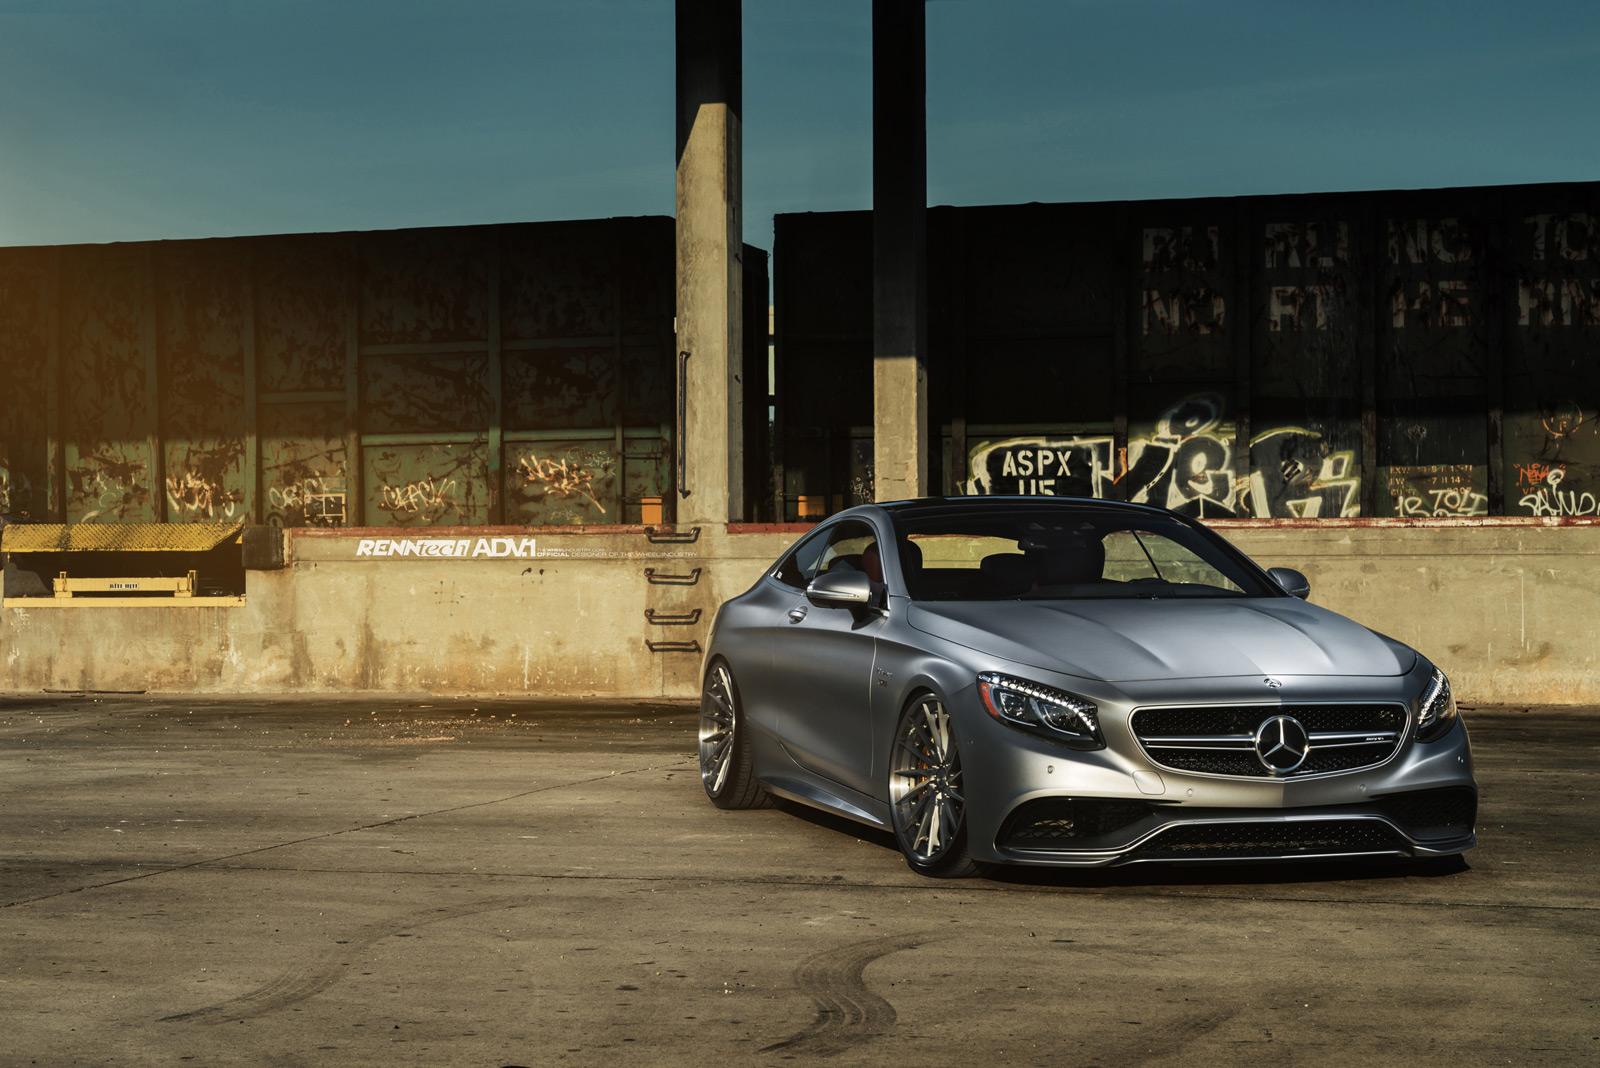 Mercedes S63 AMG Coupe + ADV.1 + RENNtech = Joli combo ...